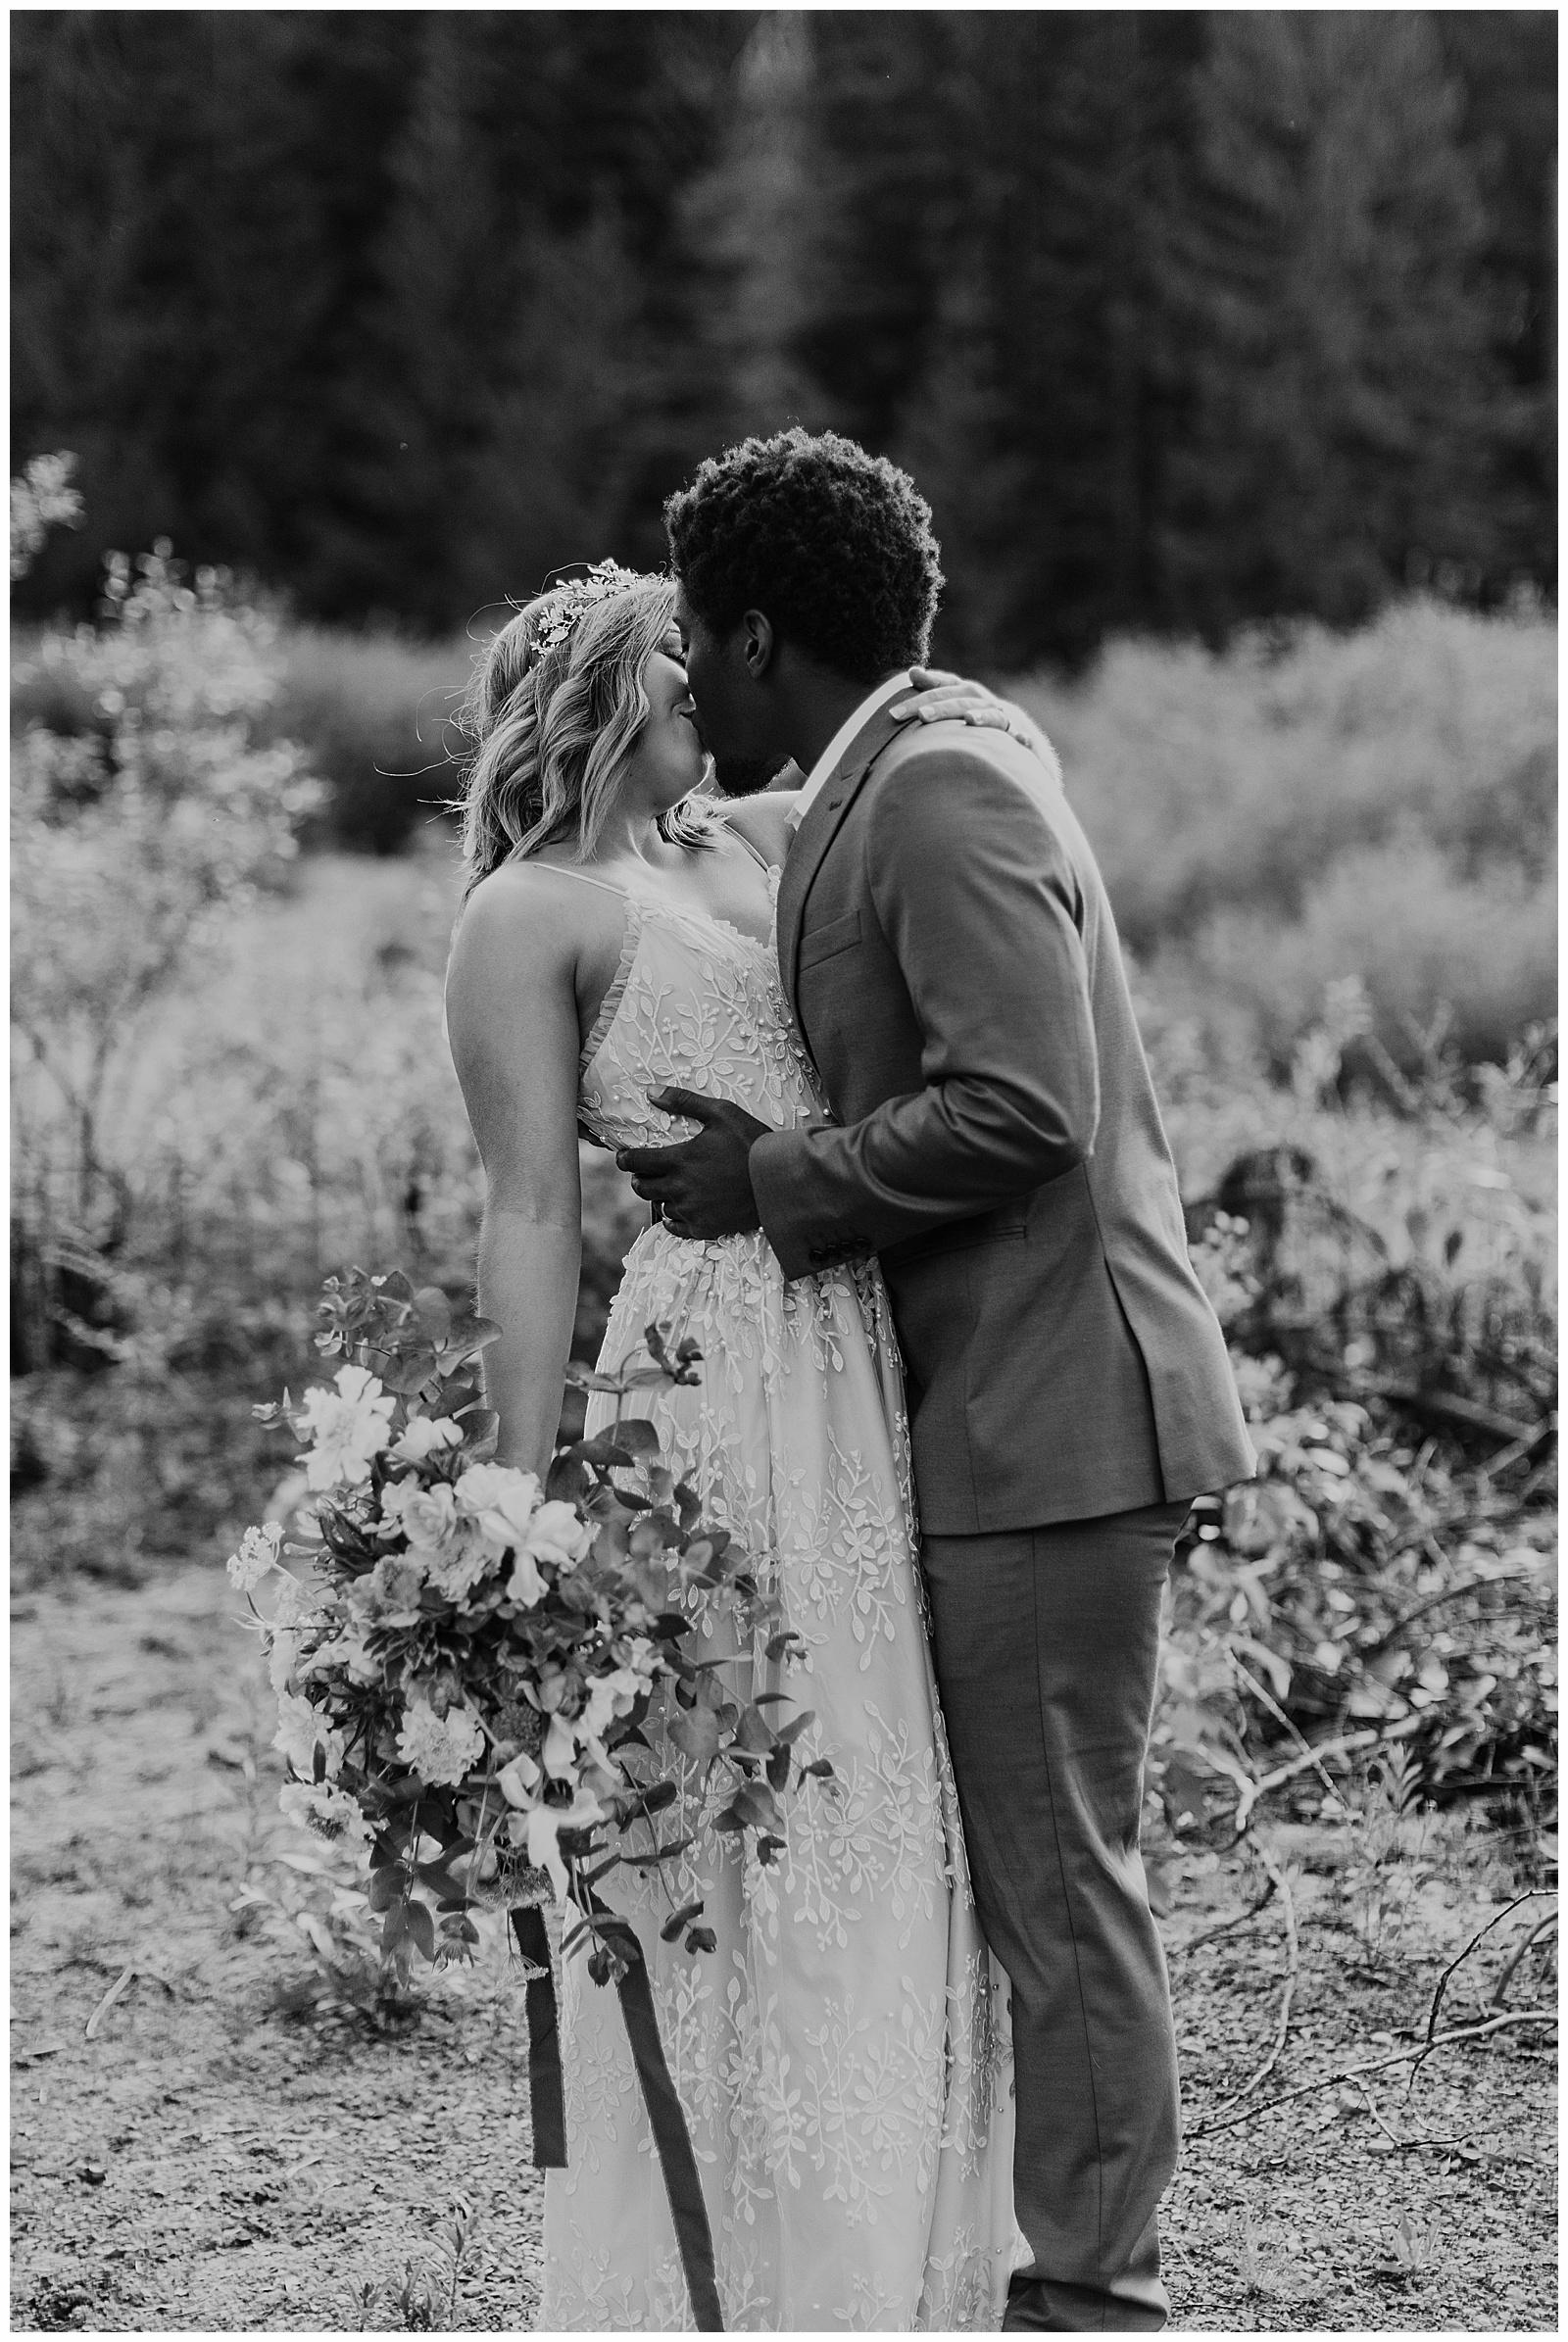 seattle-wedding-photographer-seattle-elopement-photographer-anniezav_0005.jpg